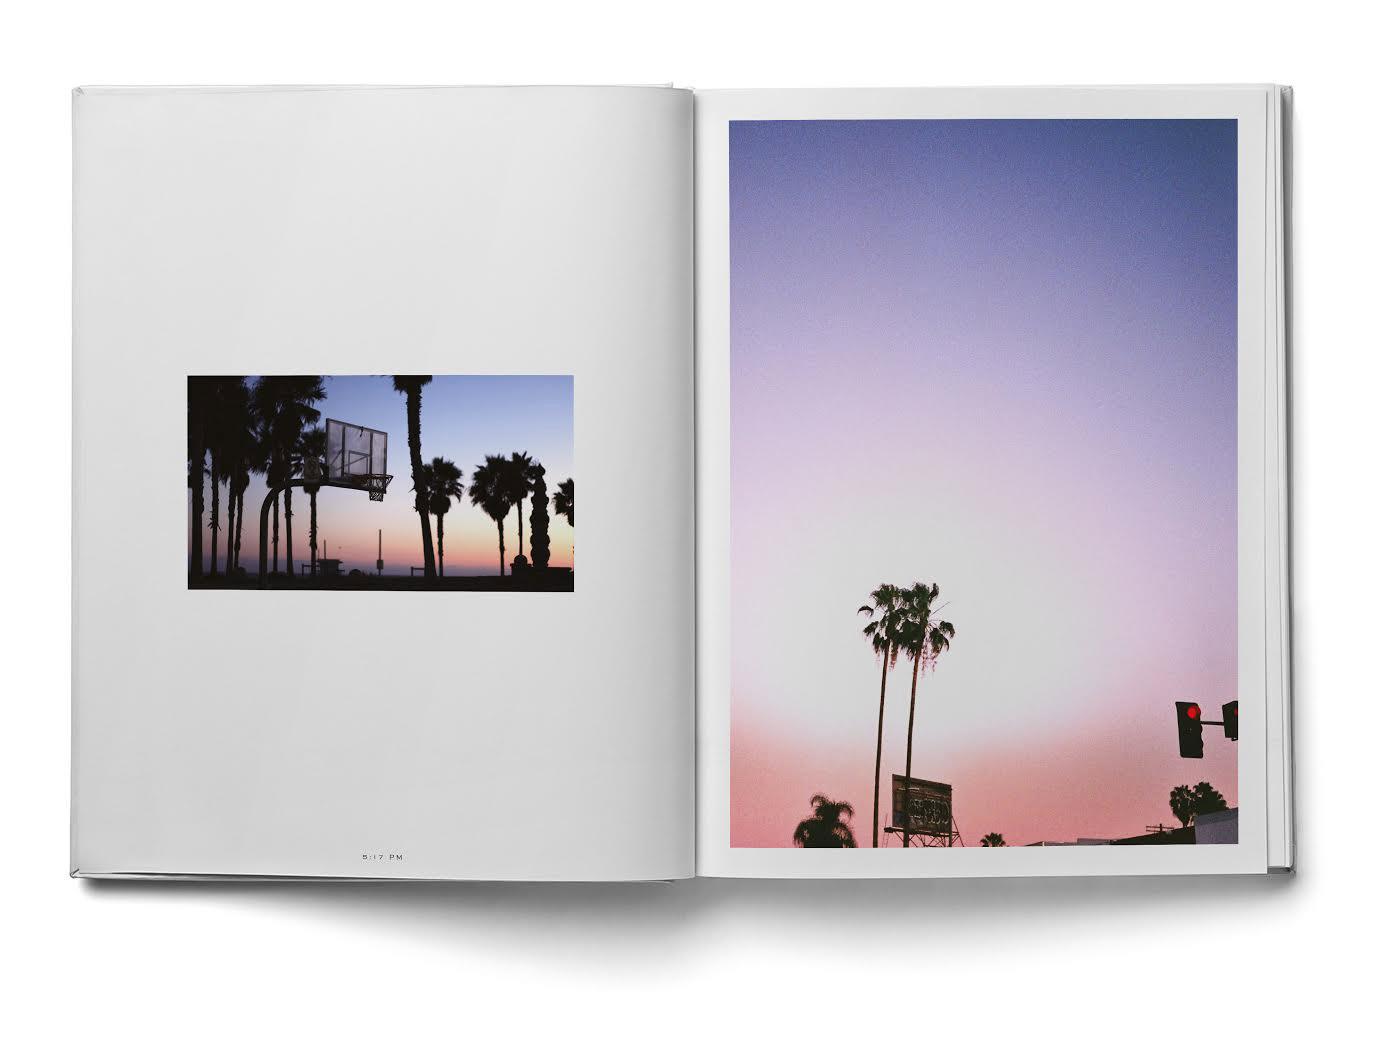 karlhab-24hlosangeles-book-4